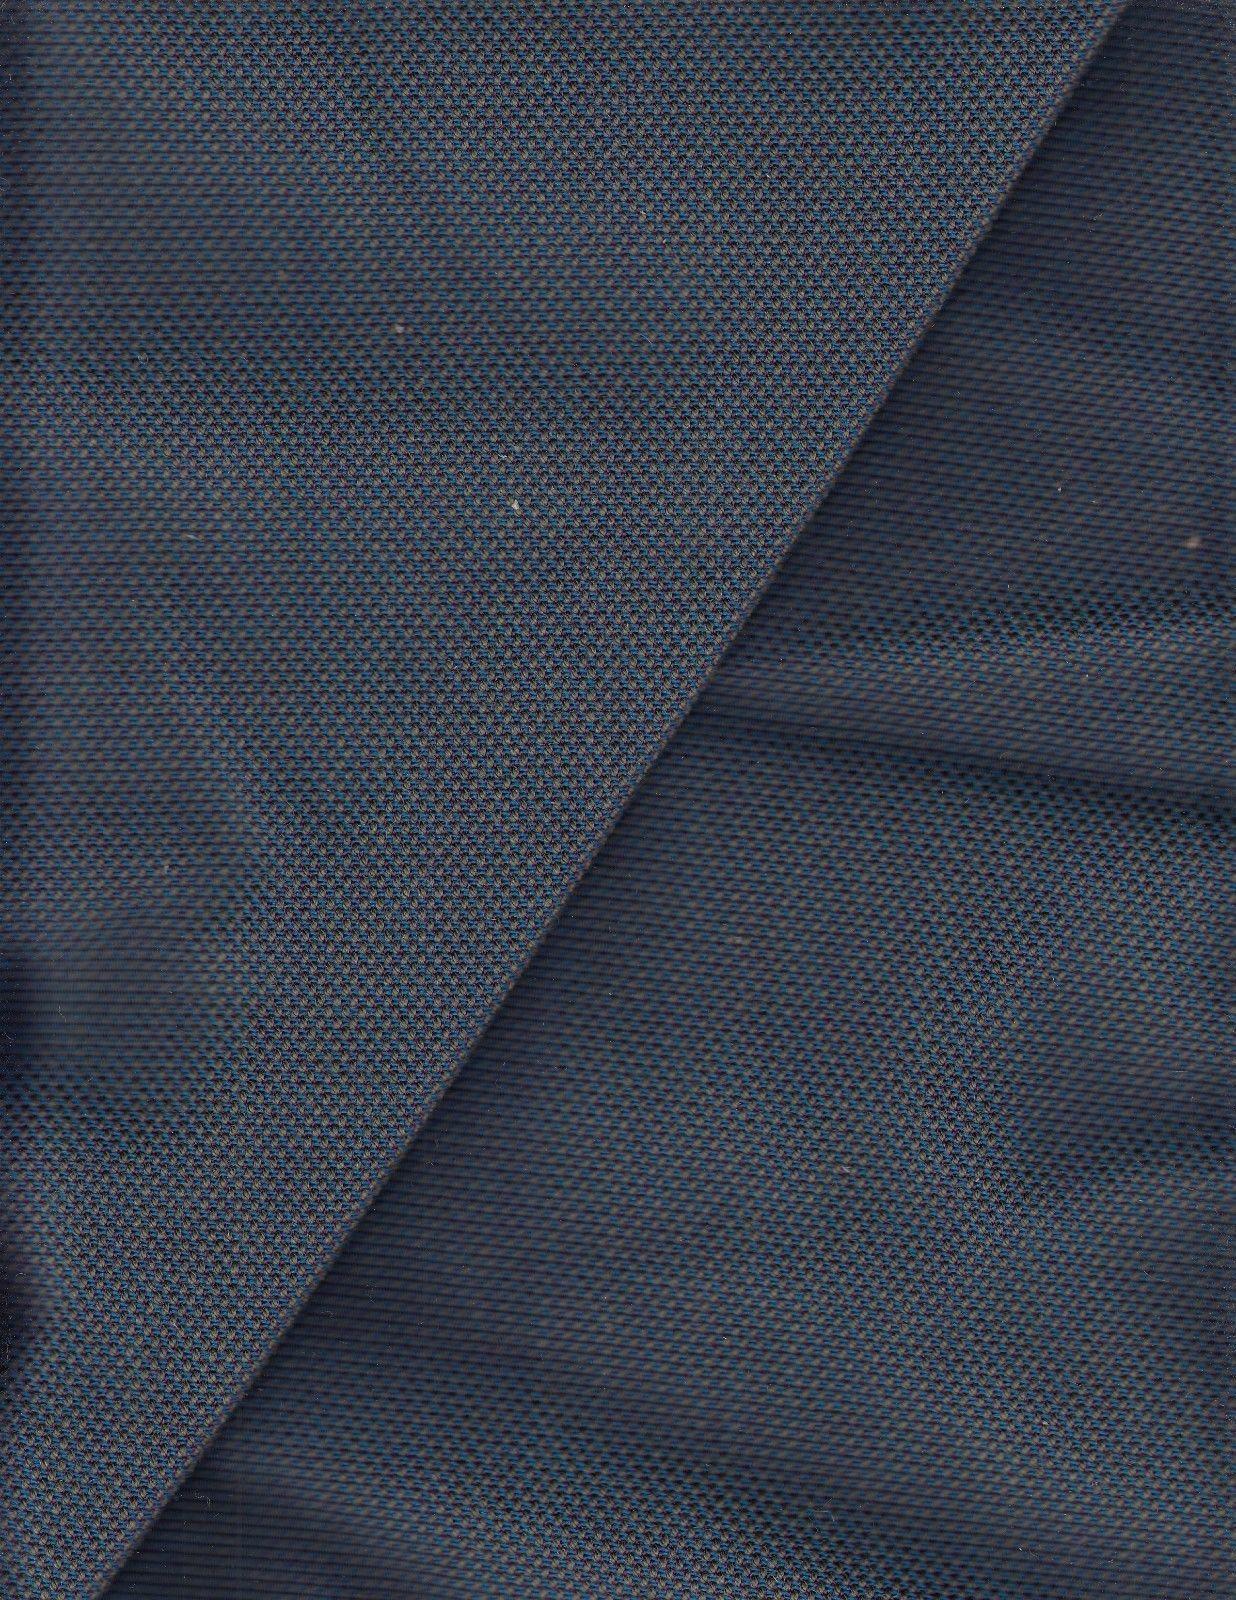 1.625 yd Maharam Upholstery Fabric Steelcut Trio Wool Green Blue 465906-883 V